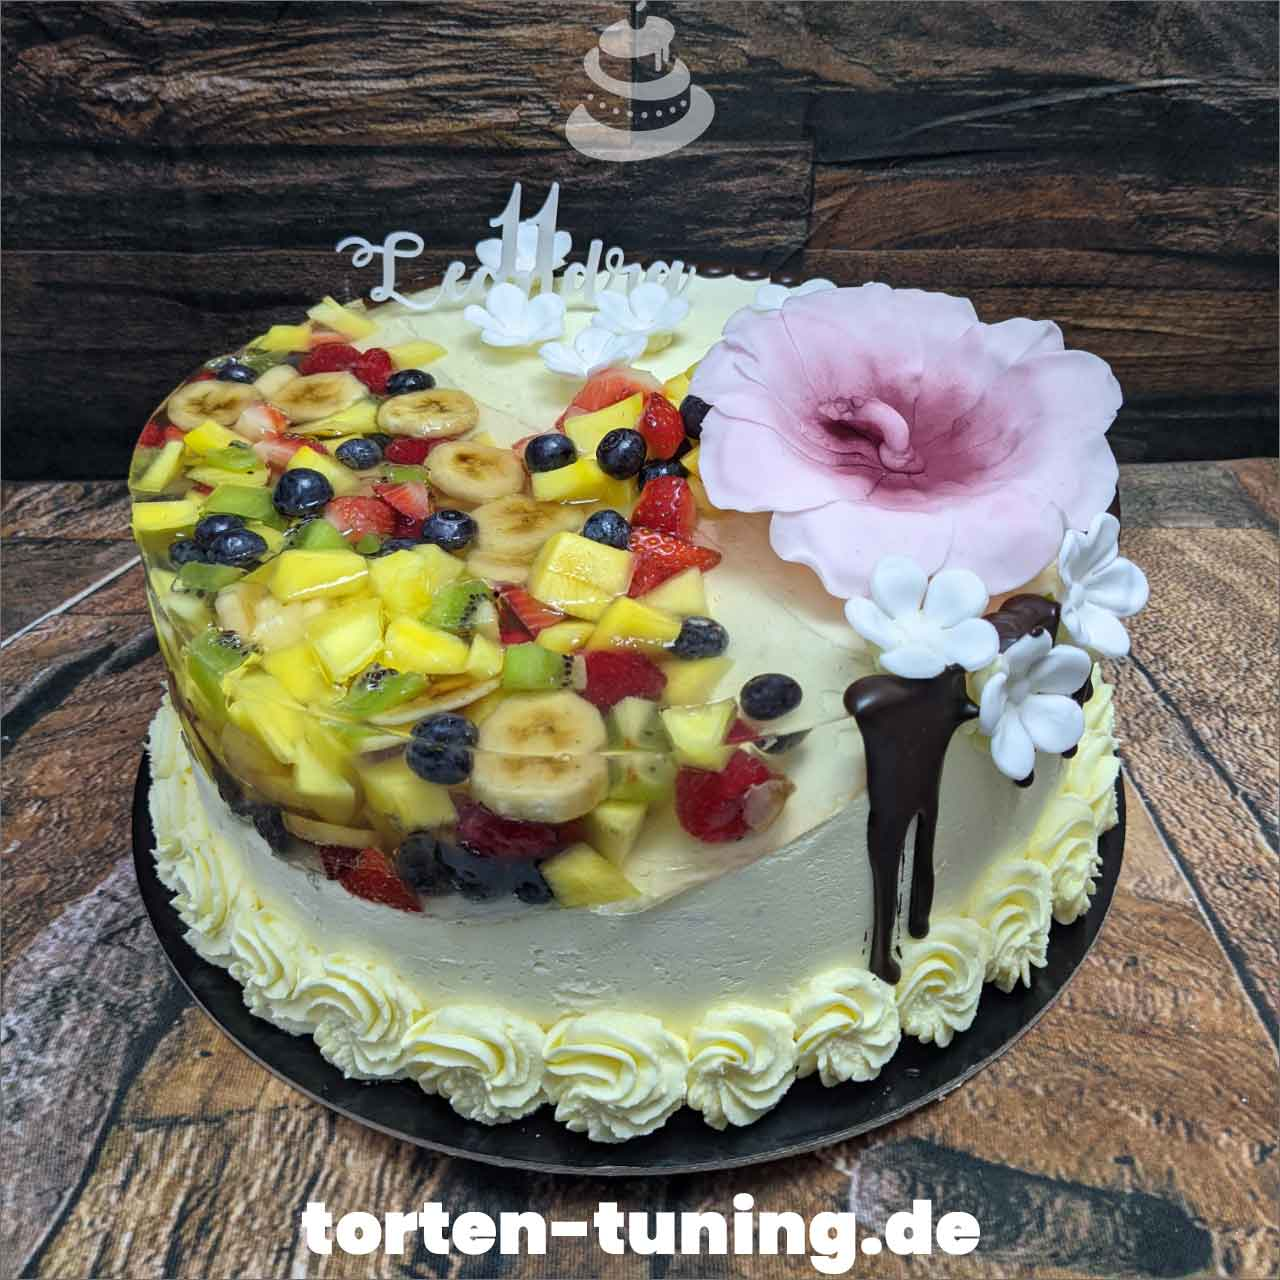 Isle Cake Obst Dripcake Obsttorte Geburtstagstorte Motivtorte Torte Tortendekoration Torte online bestellen Suhl Thüringen Torten Tuning Sahnetorte Tortenfiguren Cake Topper